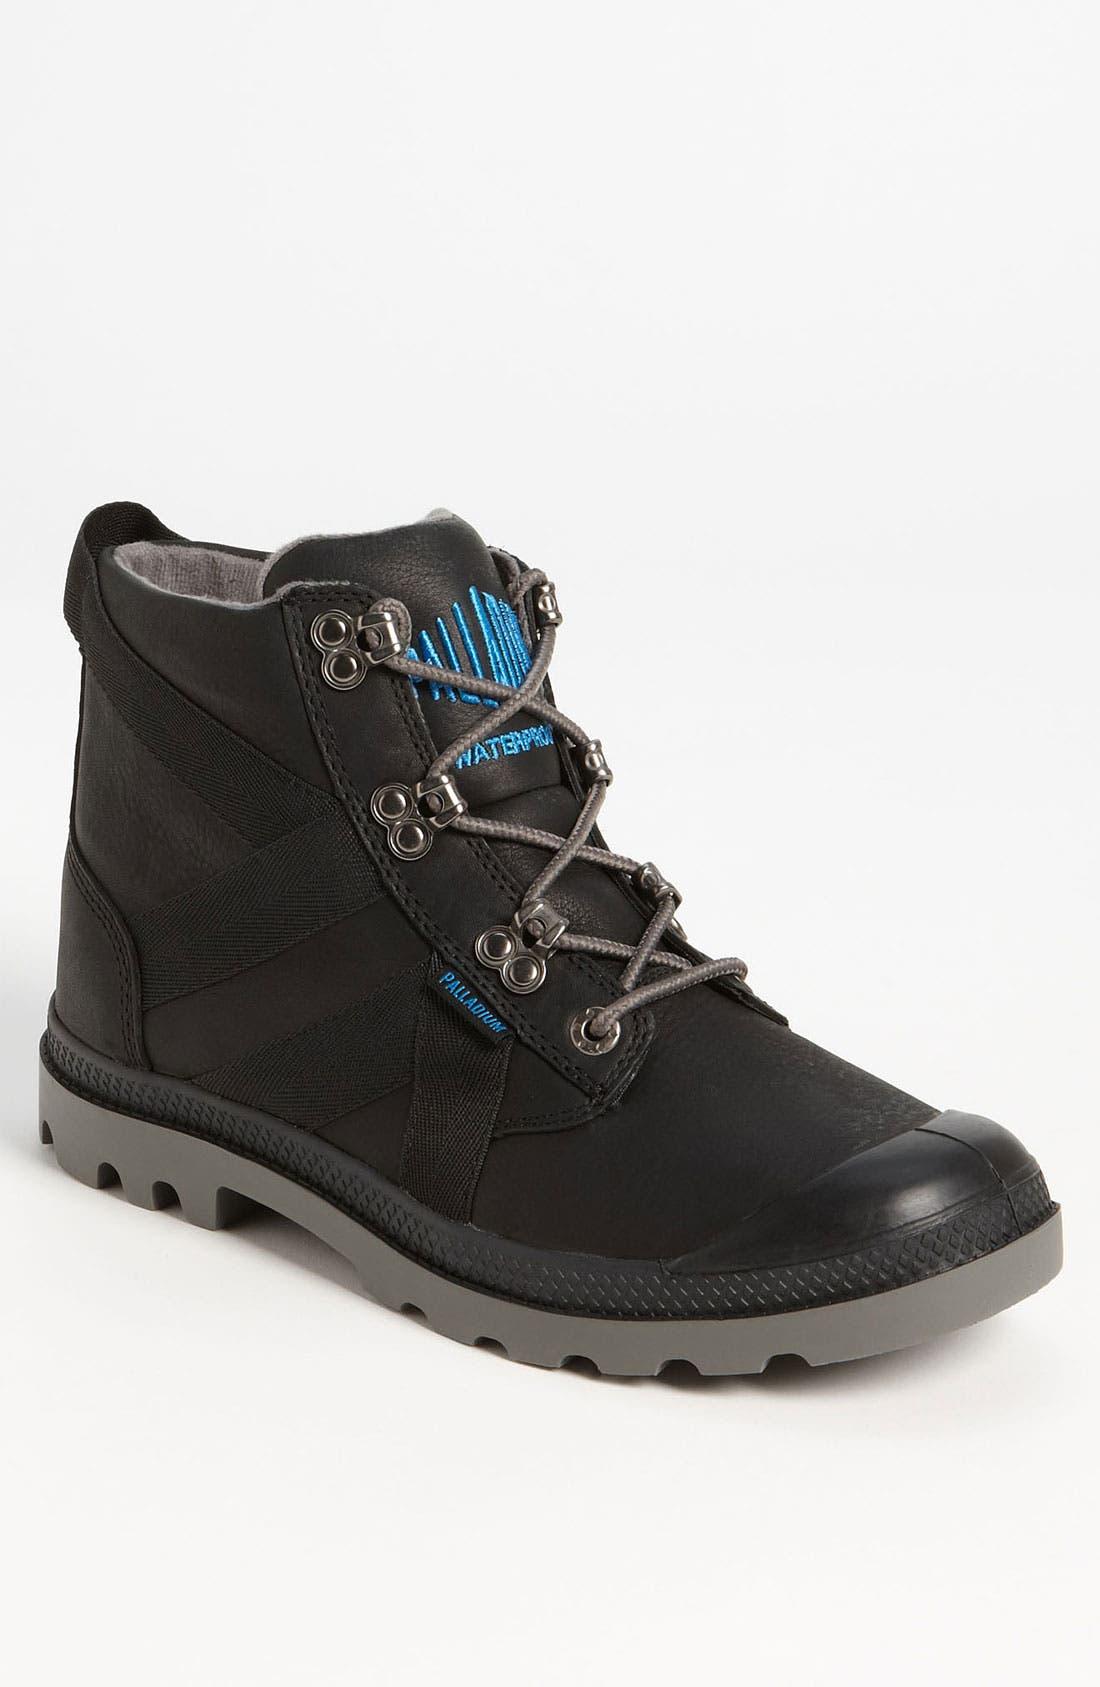 Alternate Image 1 Selected - Palladium 'Pampa' Boot